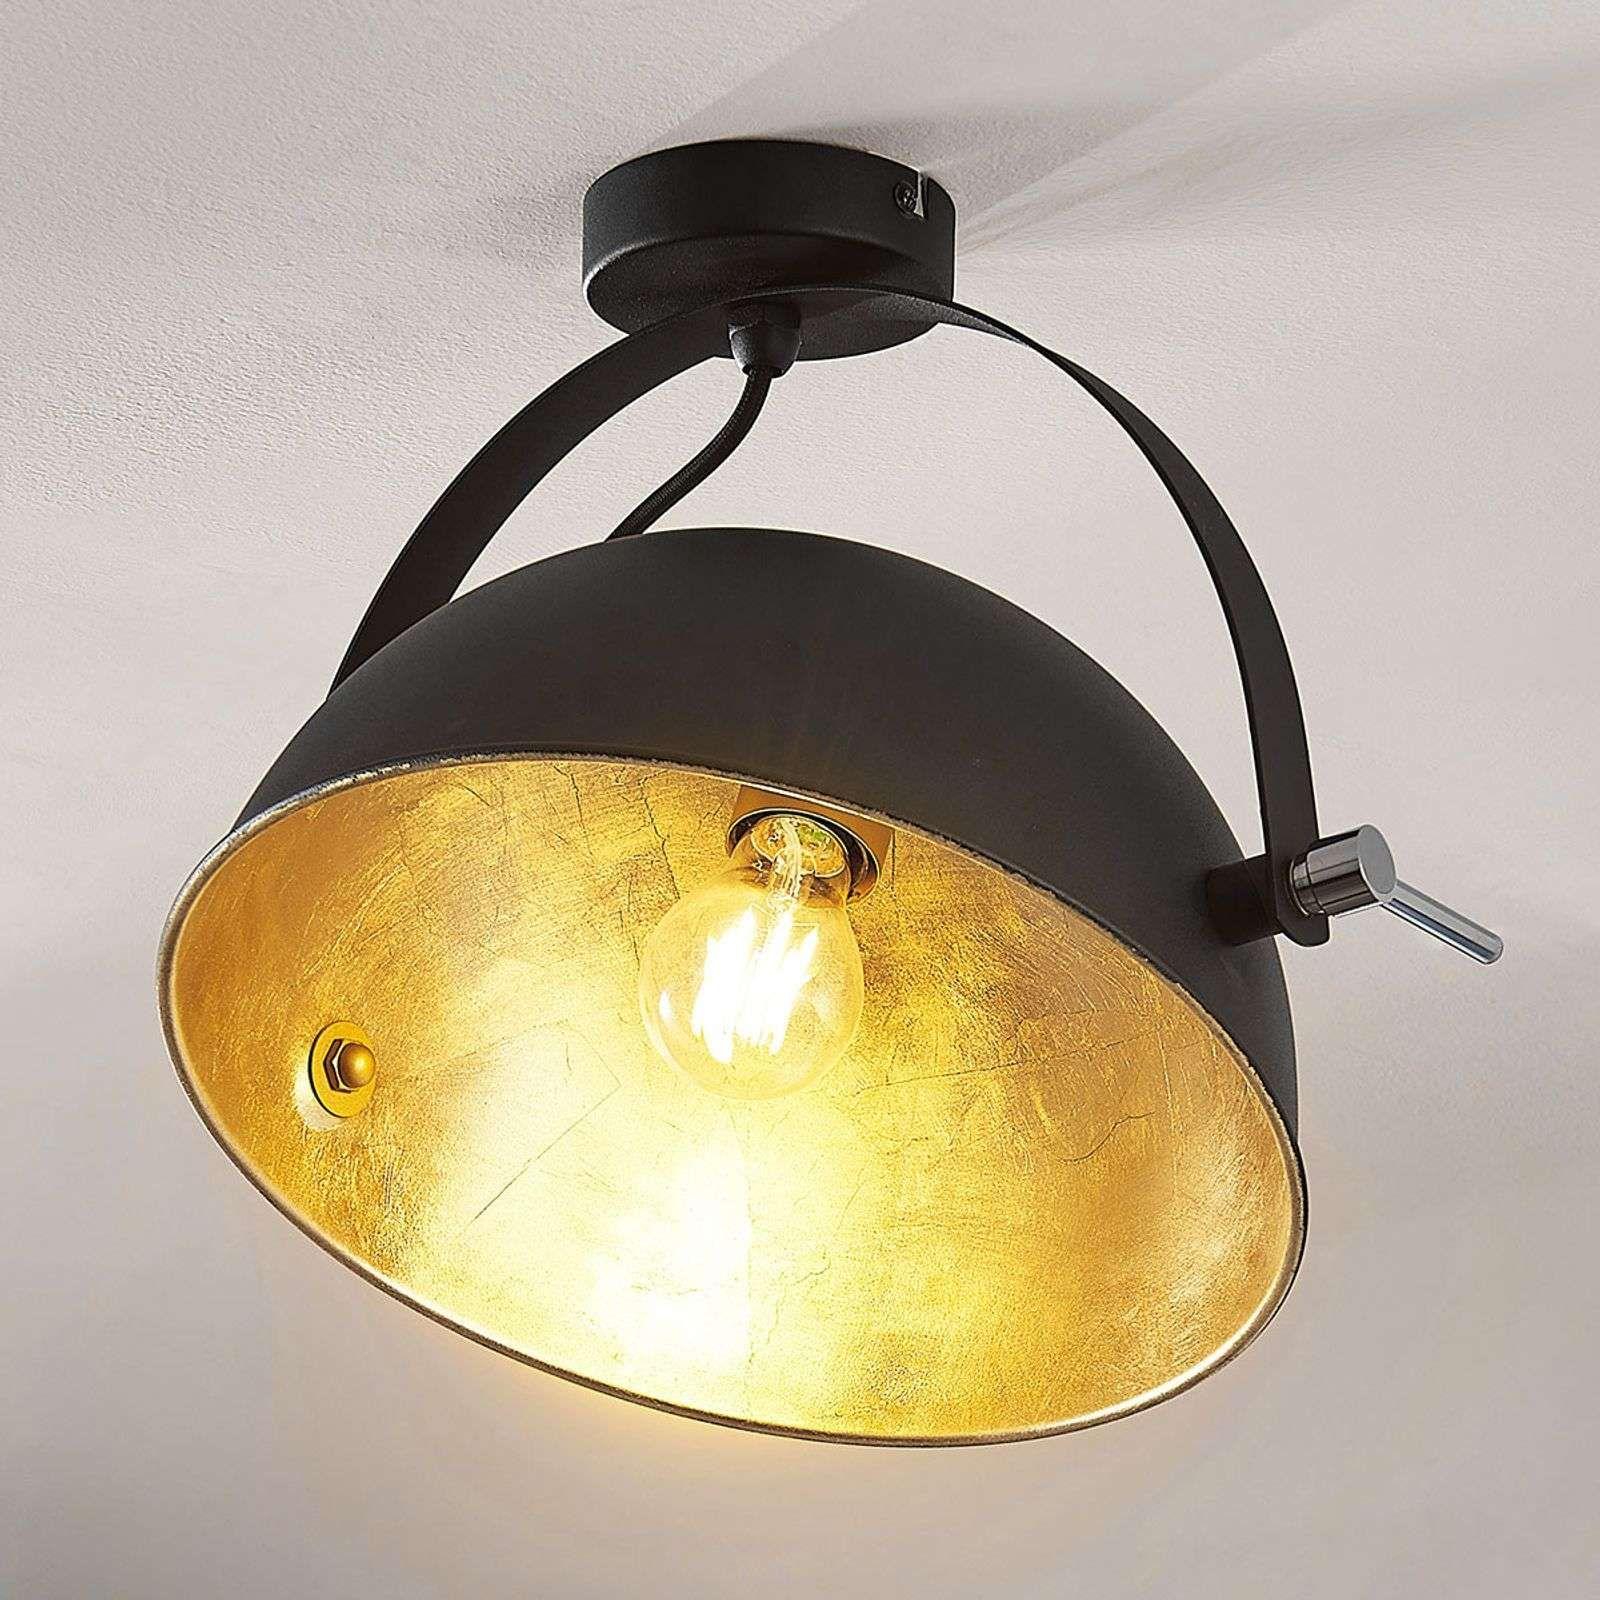 Plafondlamp Ophangen Centraaldoos Moderne Plafondverlichting Slaapkamer Plafondlamp Philips Instyle Quine P Plafondlamp Zwart Goud Slaapkamer Plafondlamp